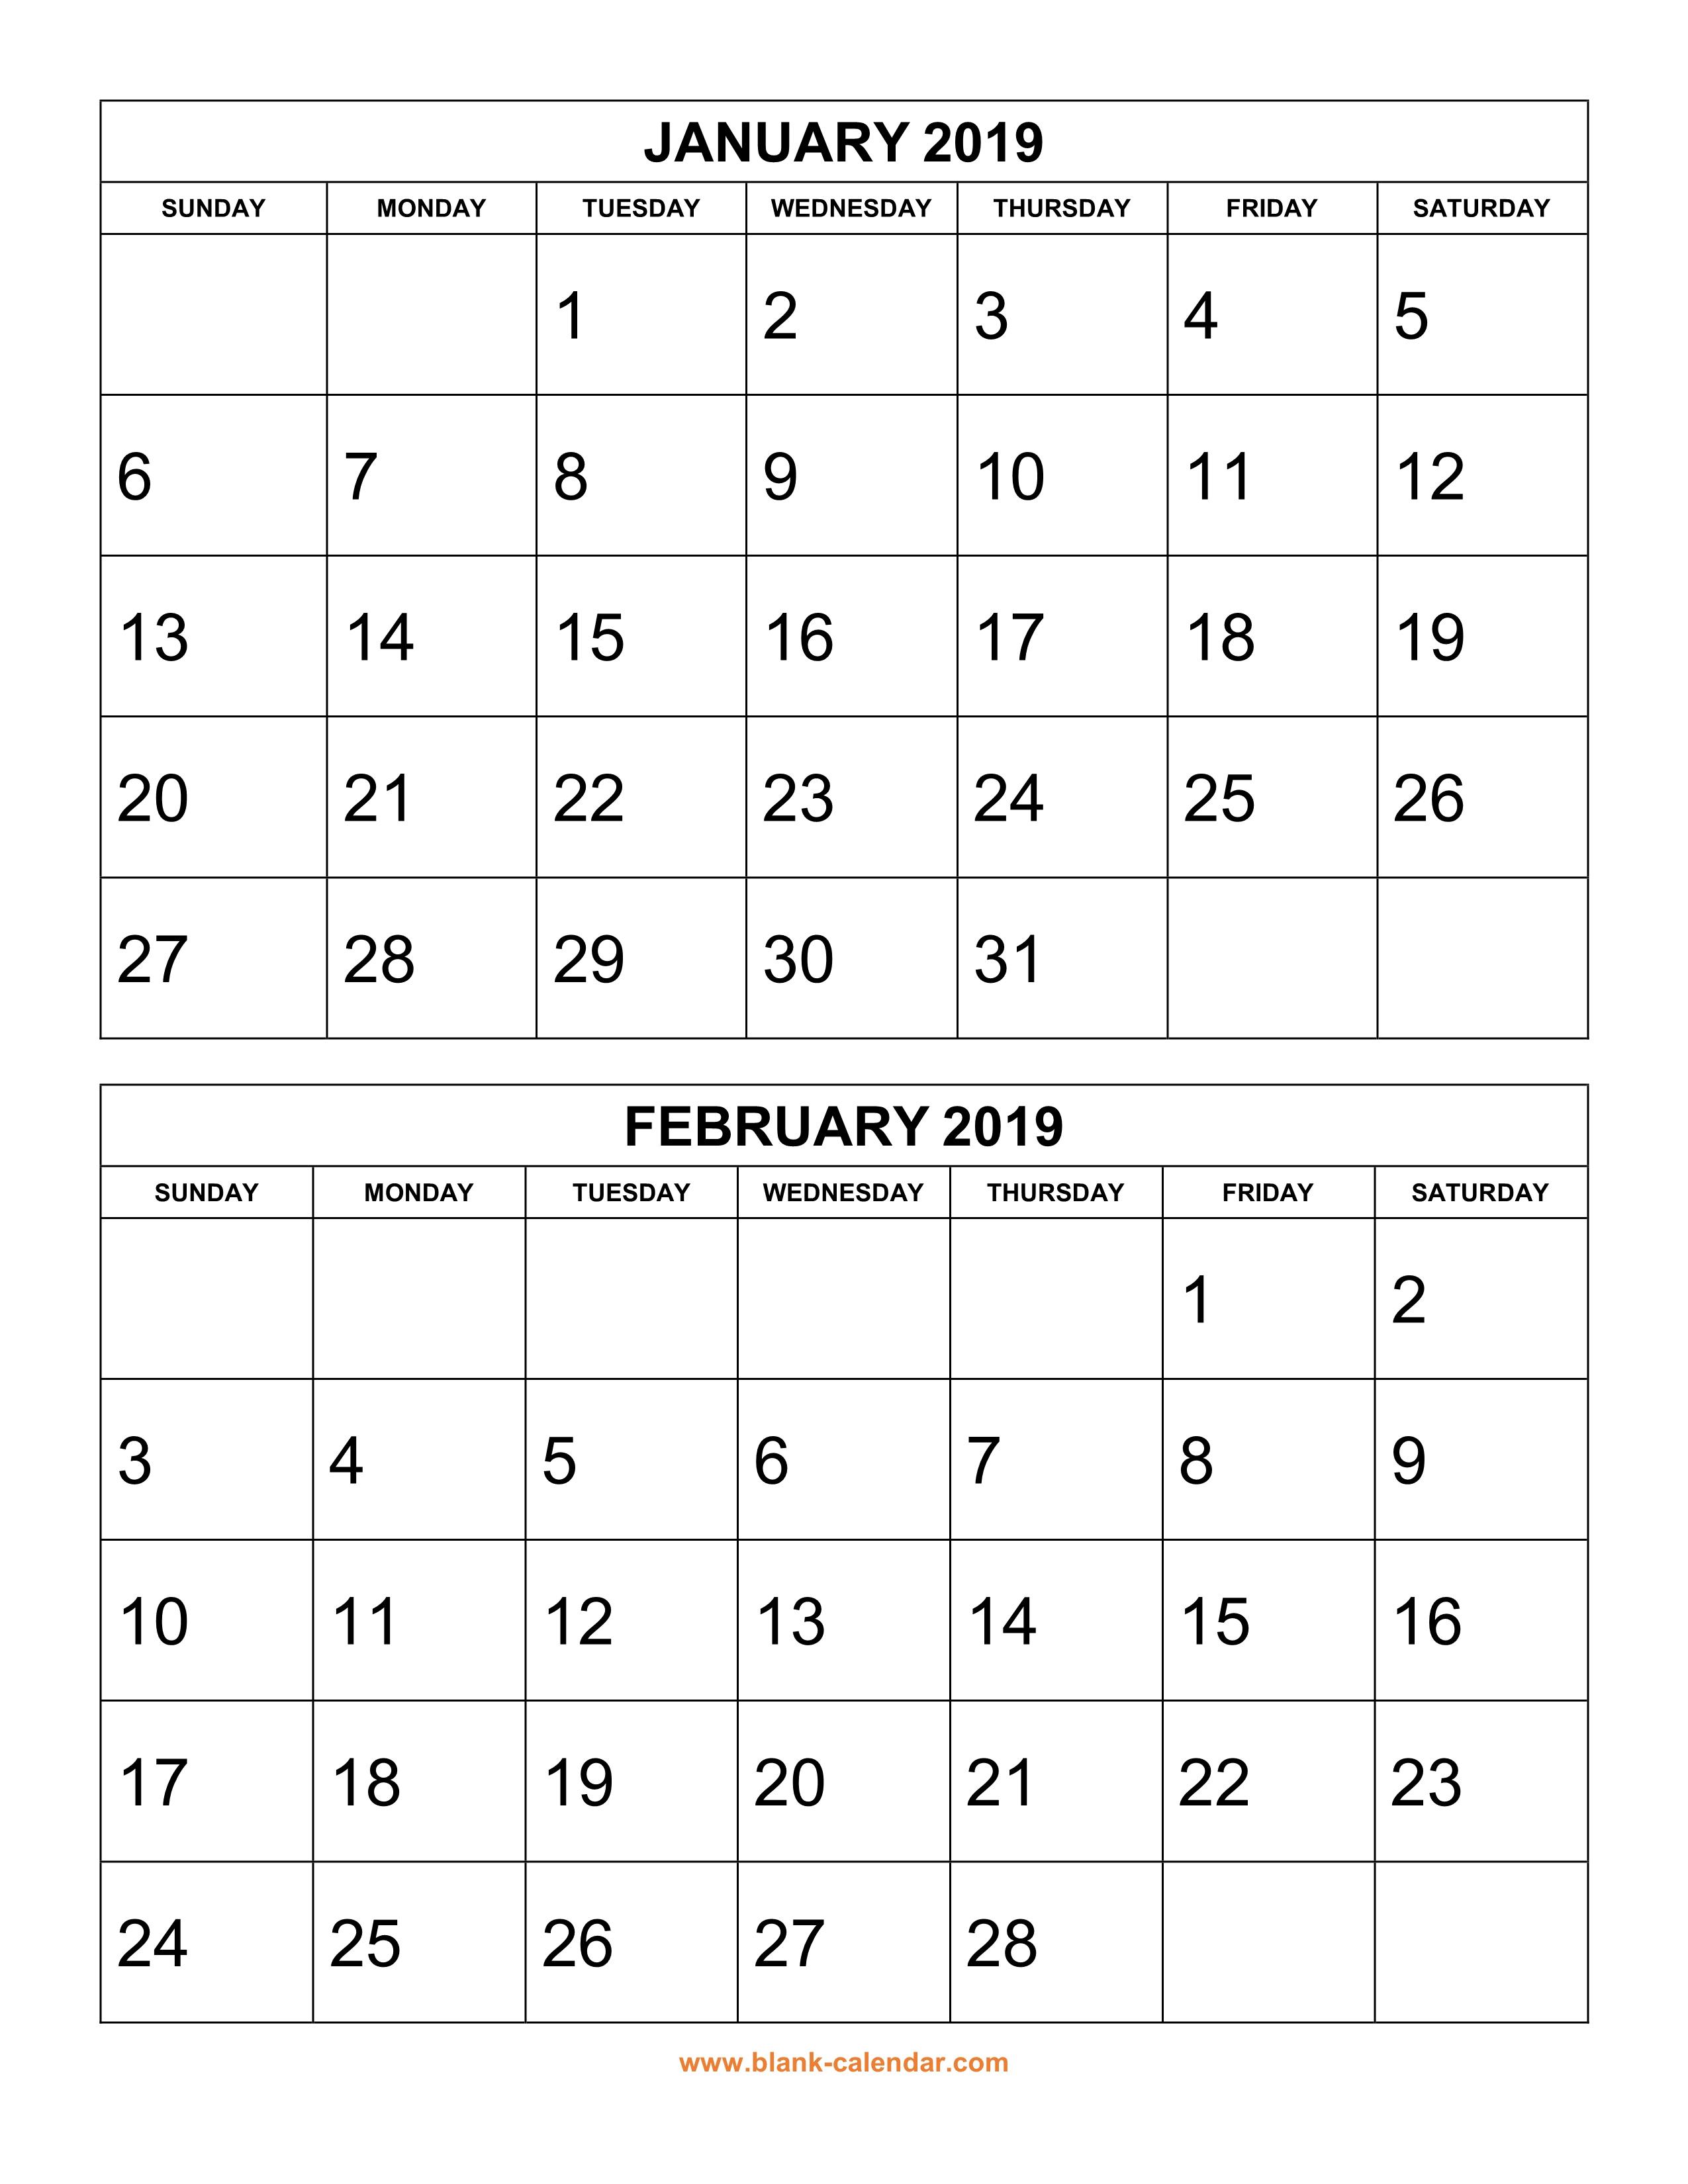 Free Download Printable Calendar 2019, 2 Months Per Page, 6 Pages inside Pocket Printable 2019-2020 Calendar Free